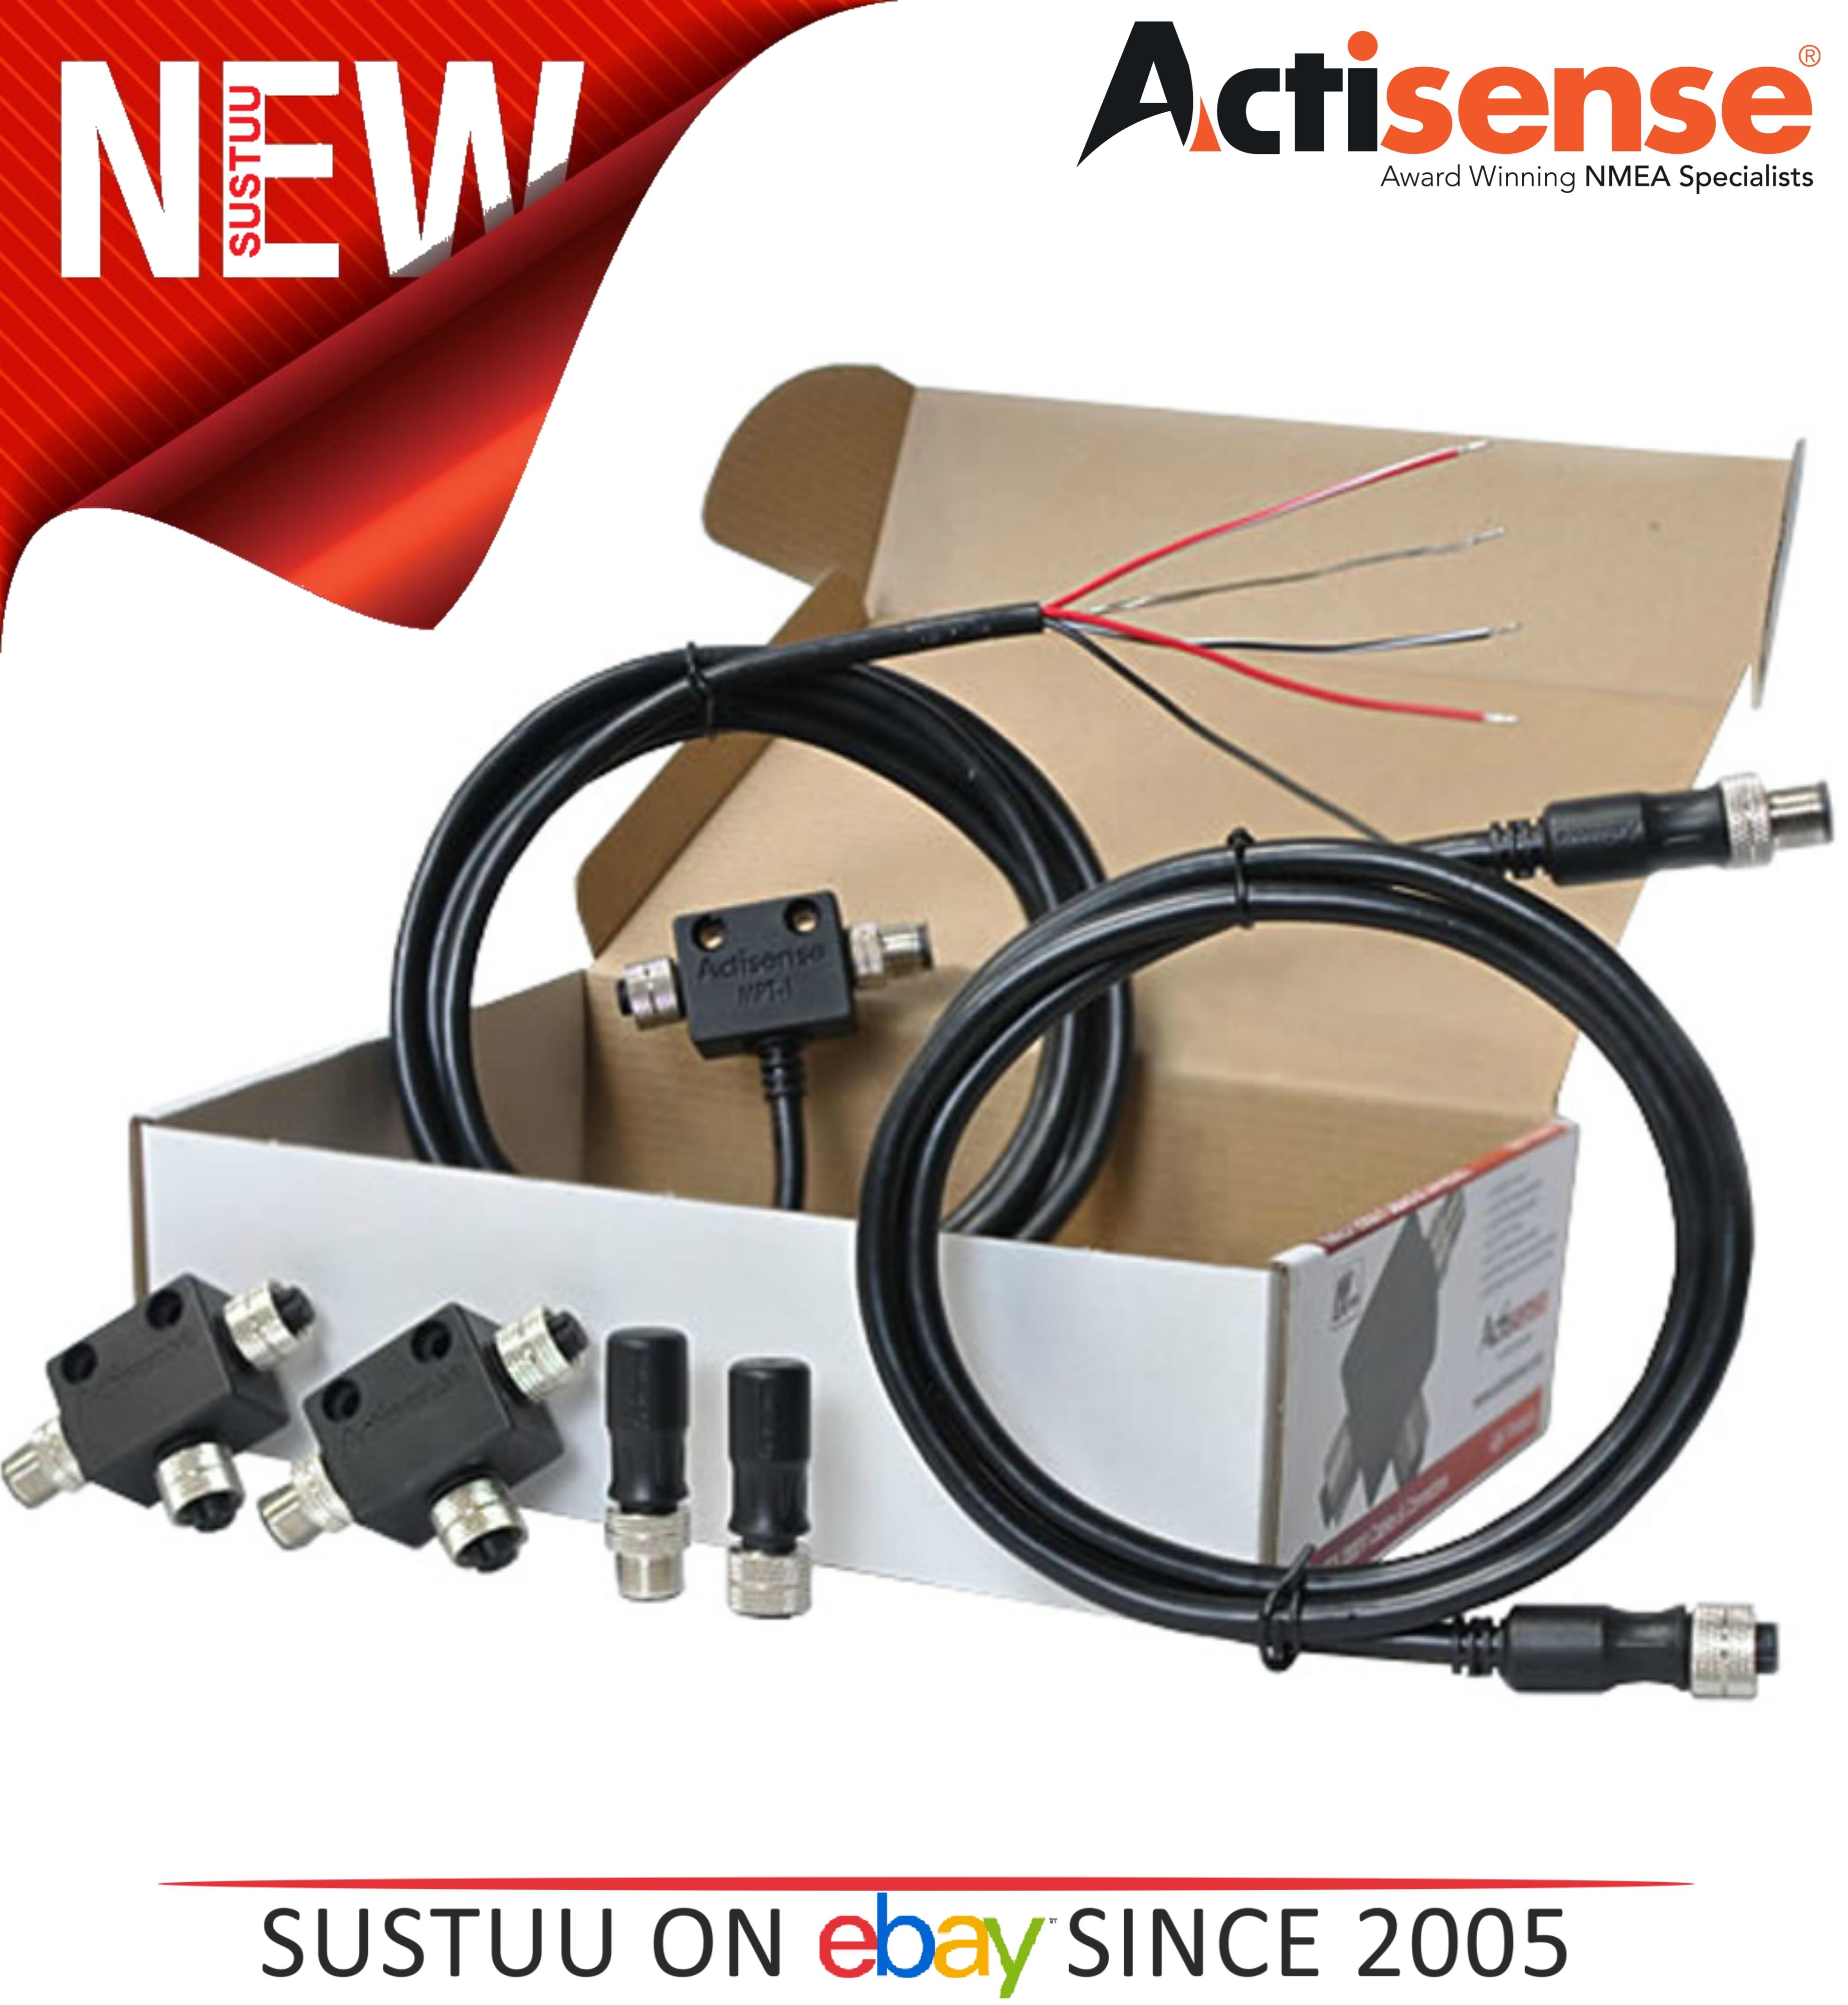 Actisense A2K-KIT-1 Micro Starter Kit|MPT-1/TER-F/TER-M/TDC-2M/T-MFF (x2)|Boats